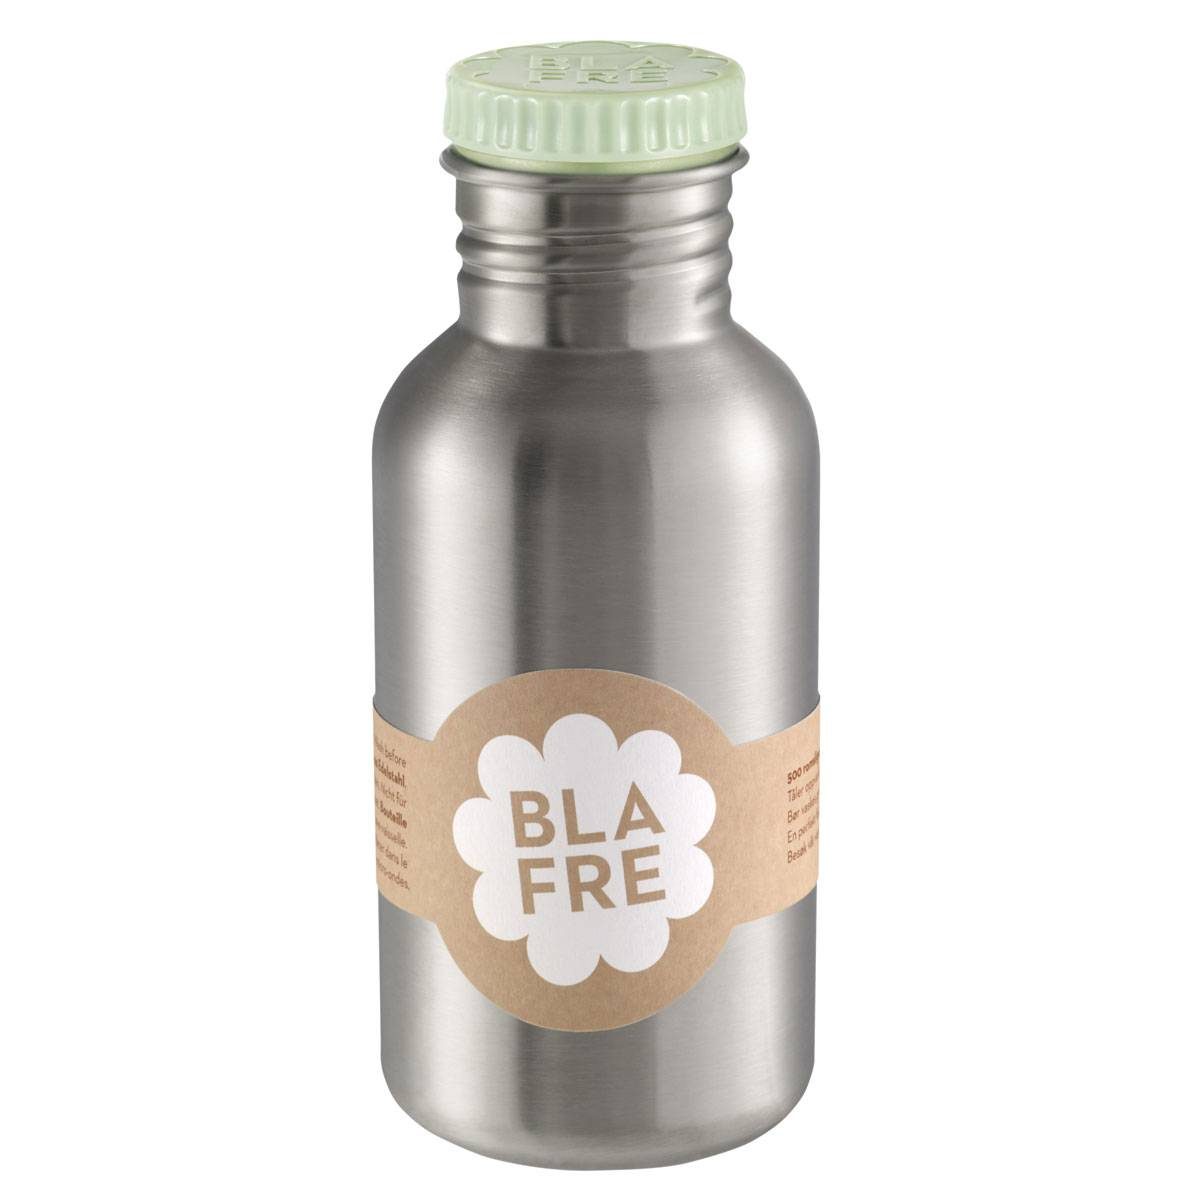 Blafre stålflaske til barn 500 ml. mintgrønn